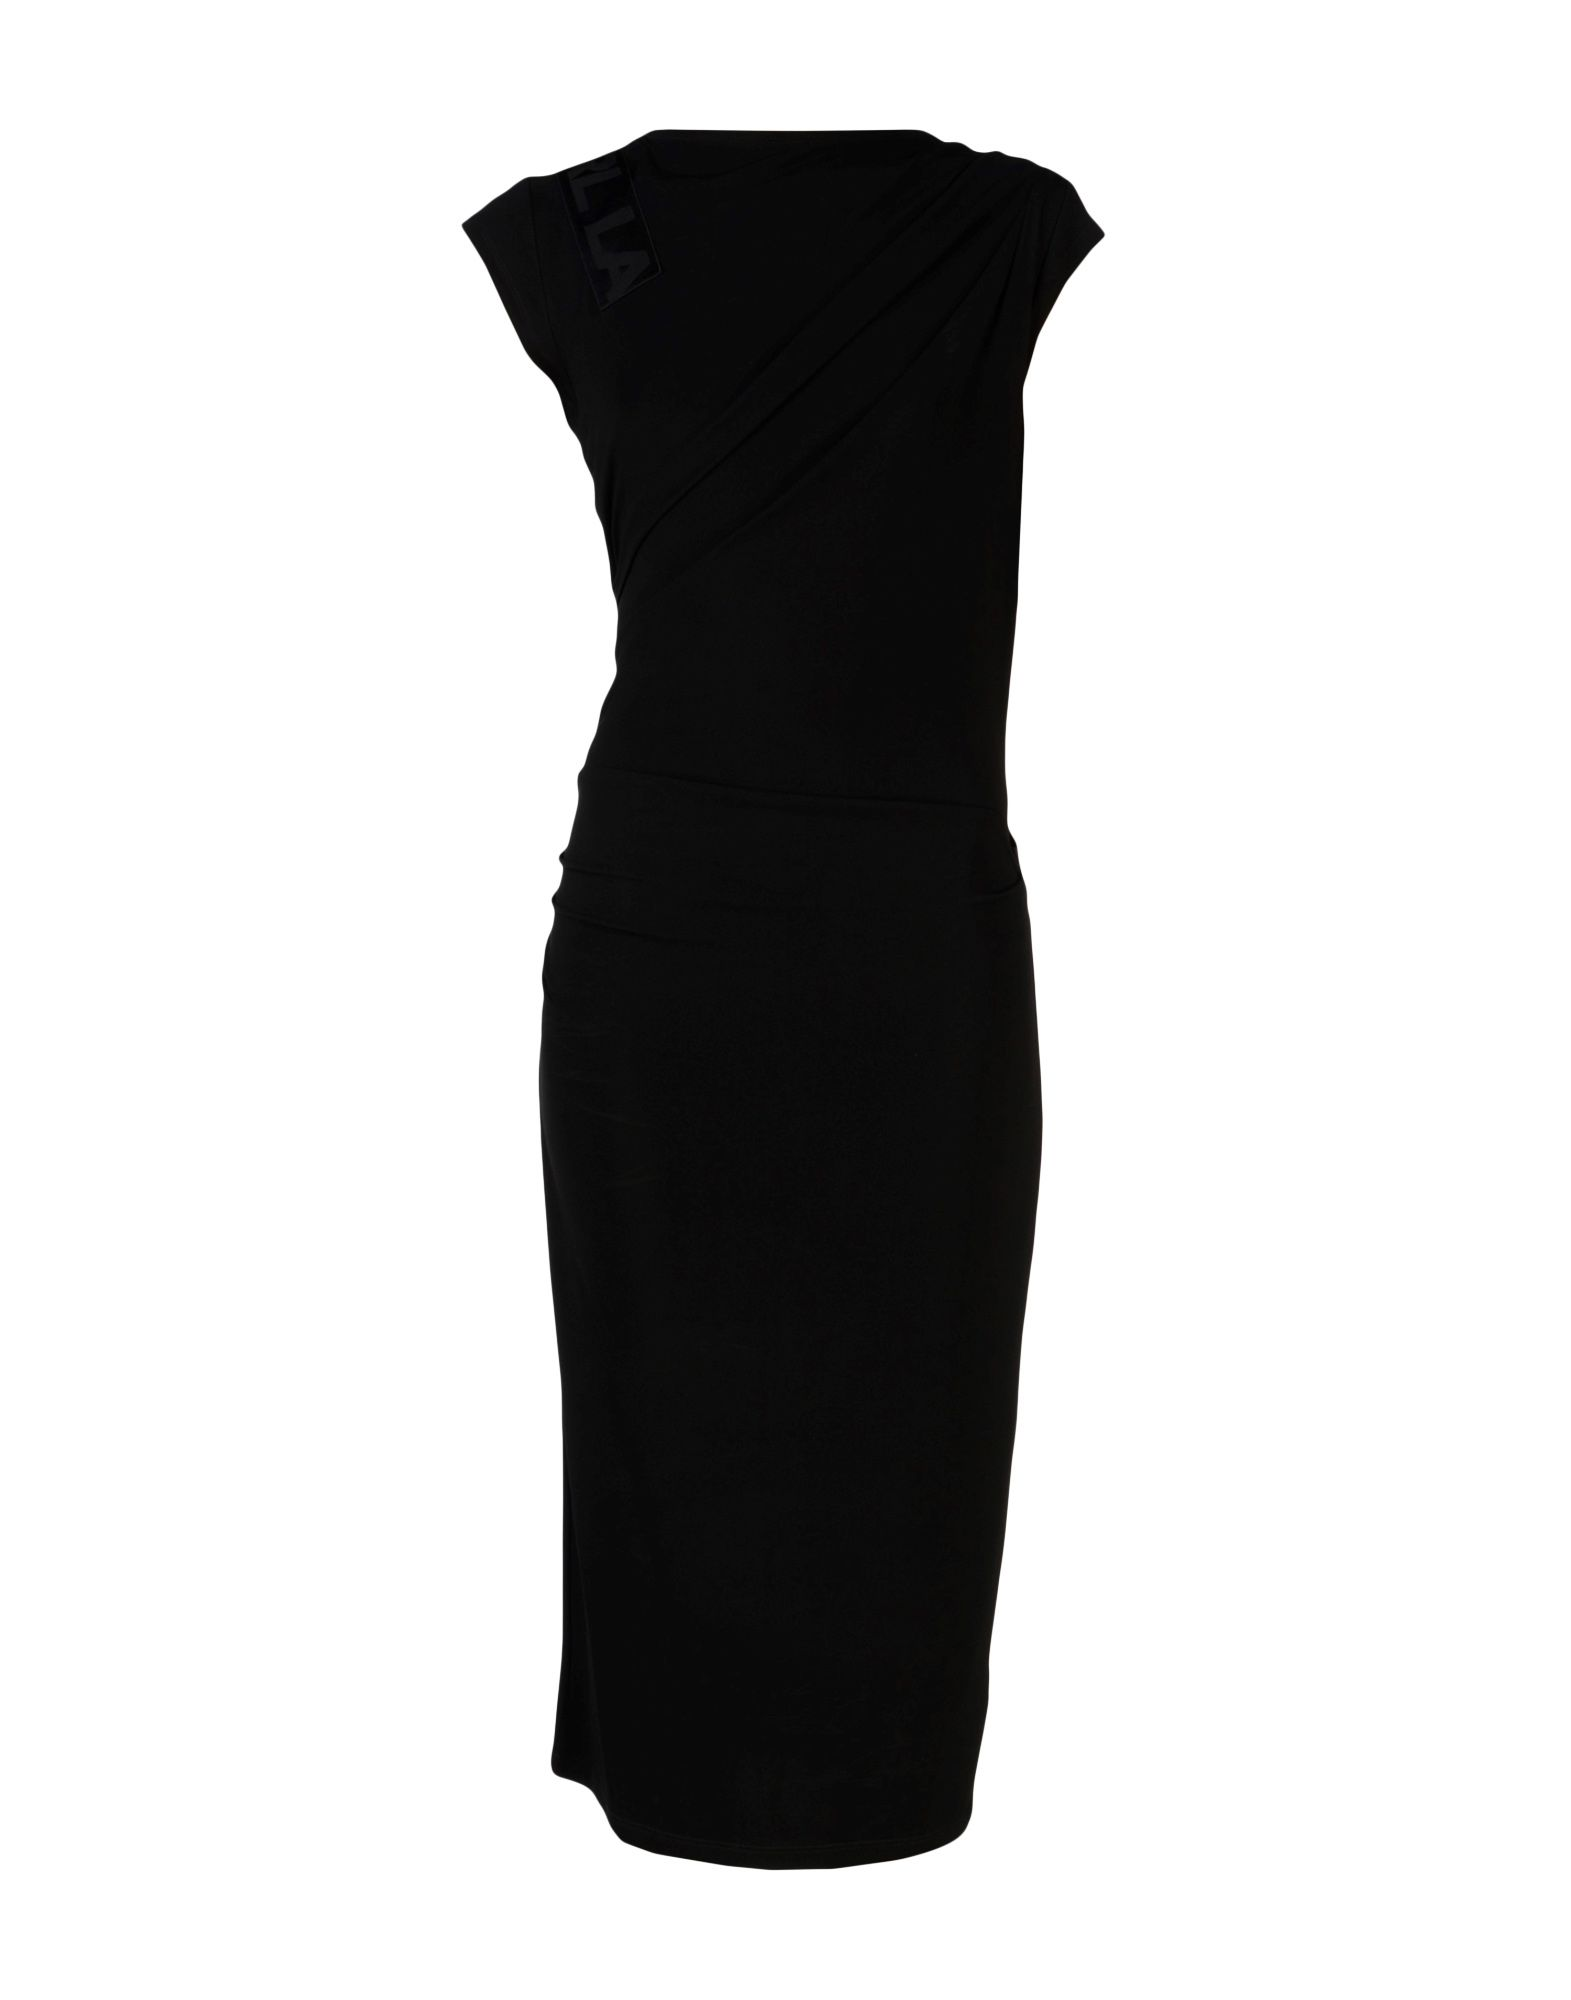 Vestito Lungo Karl Lagerfeld Donna - Acquista online su azJpoawceM